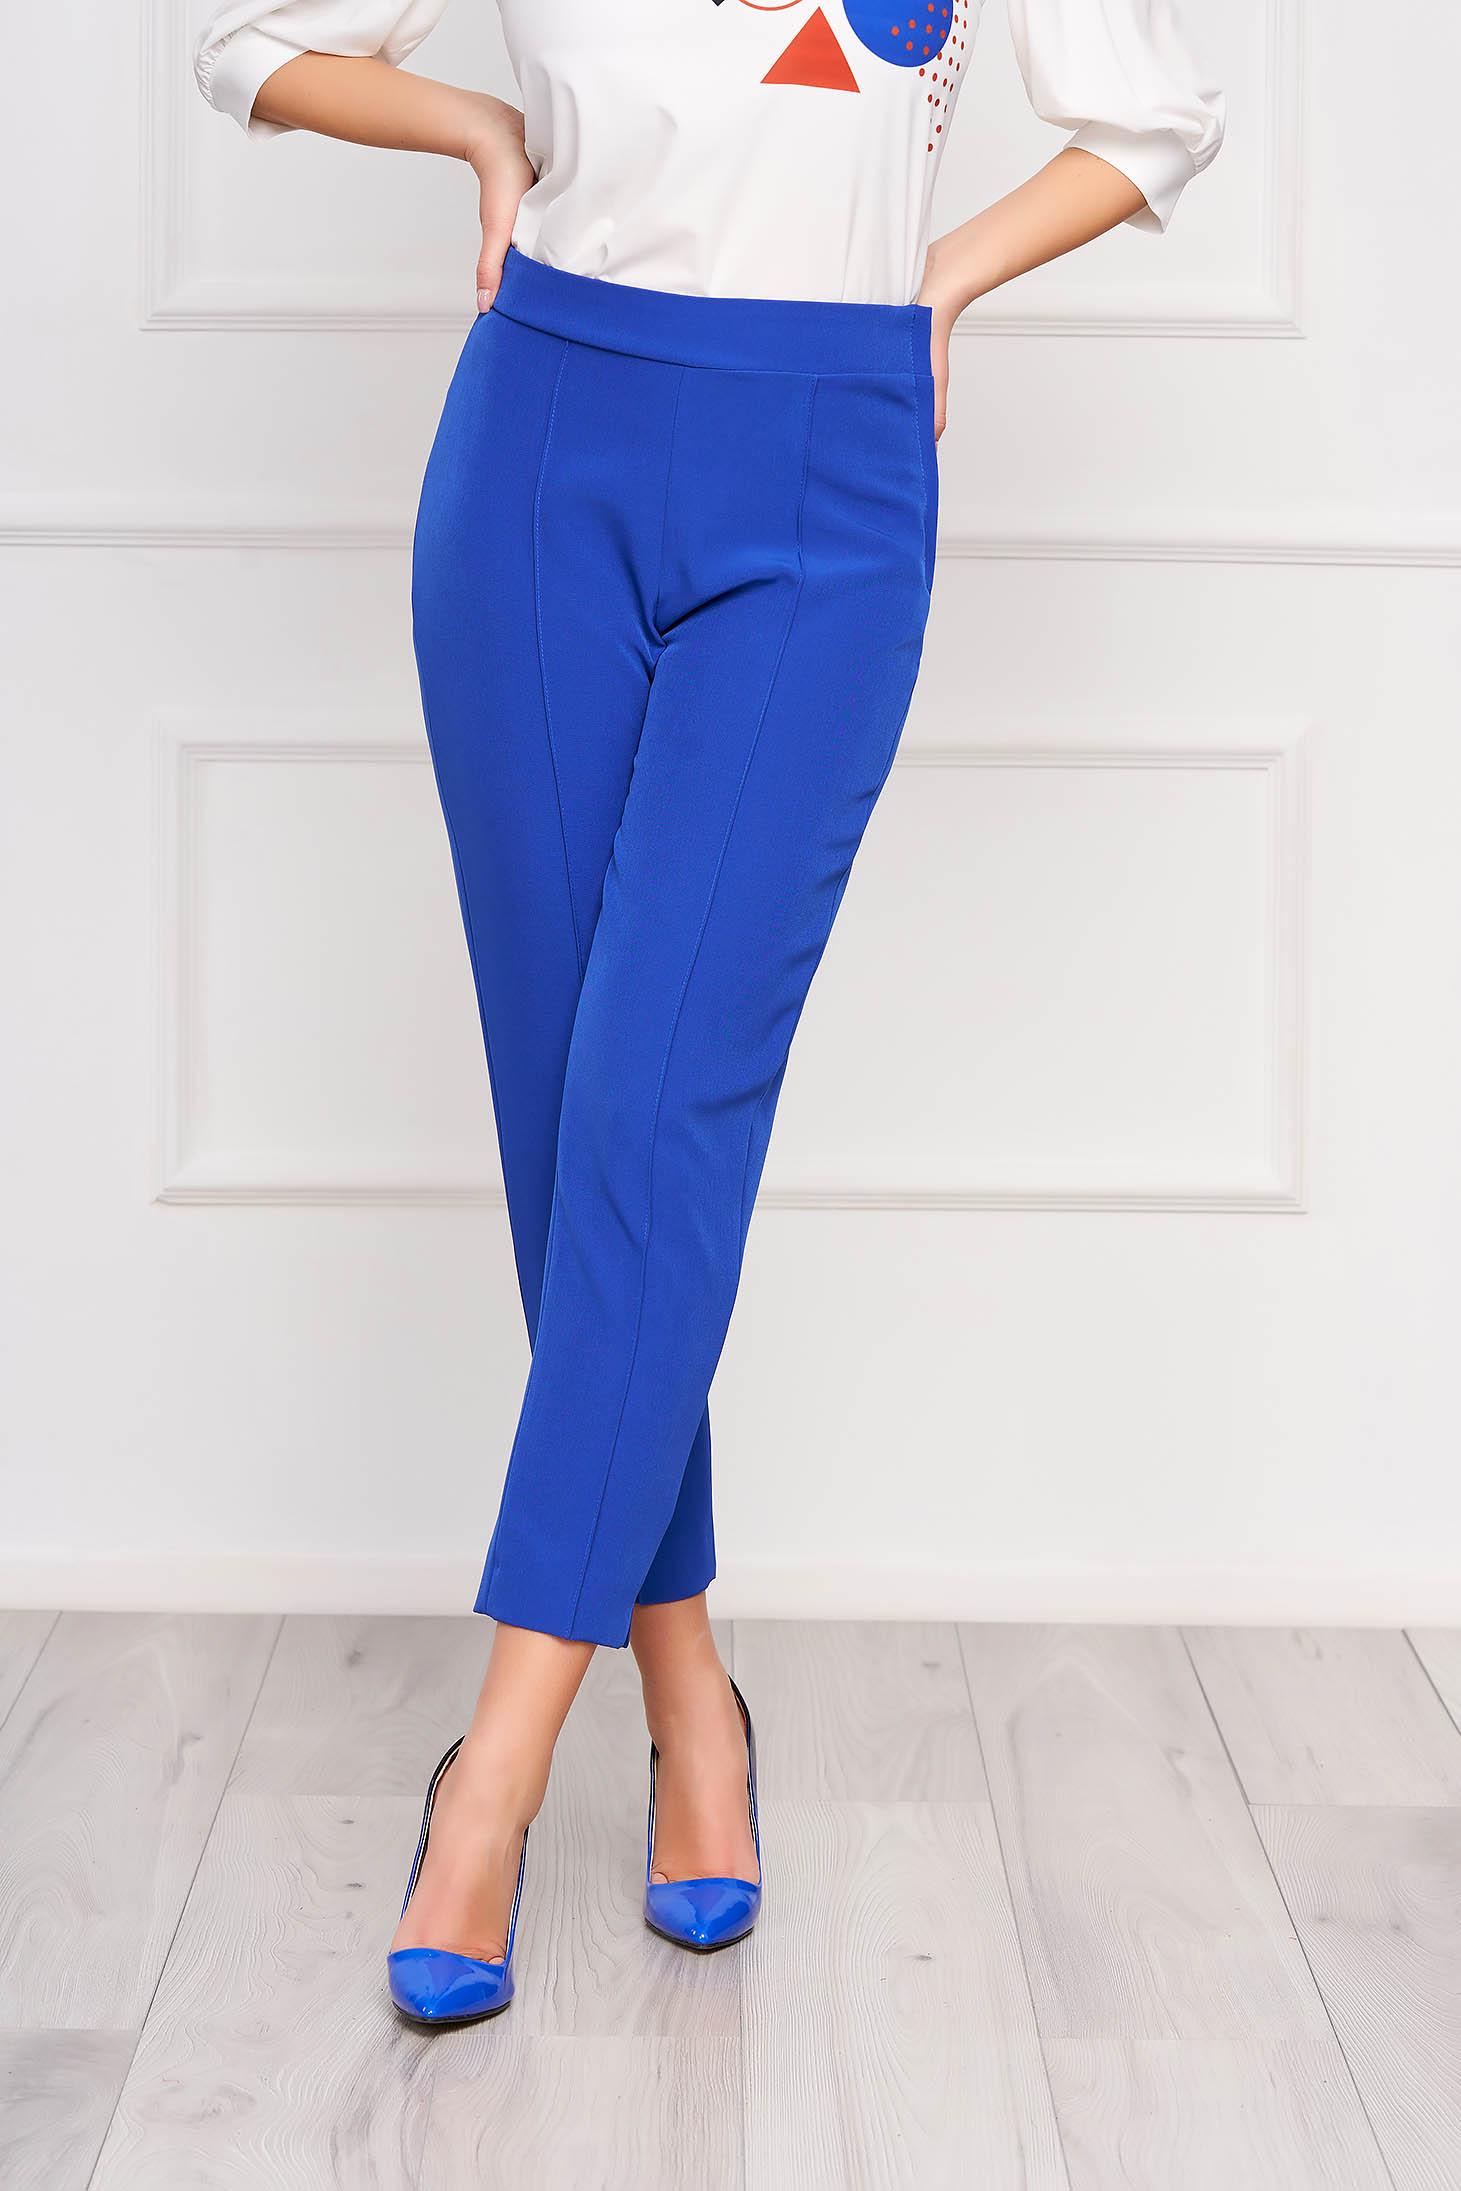 Kék StarShinerS magas derekú zsebes kónikus irodai nadrág enyhén rugalmas anyagból